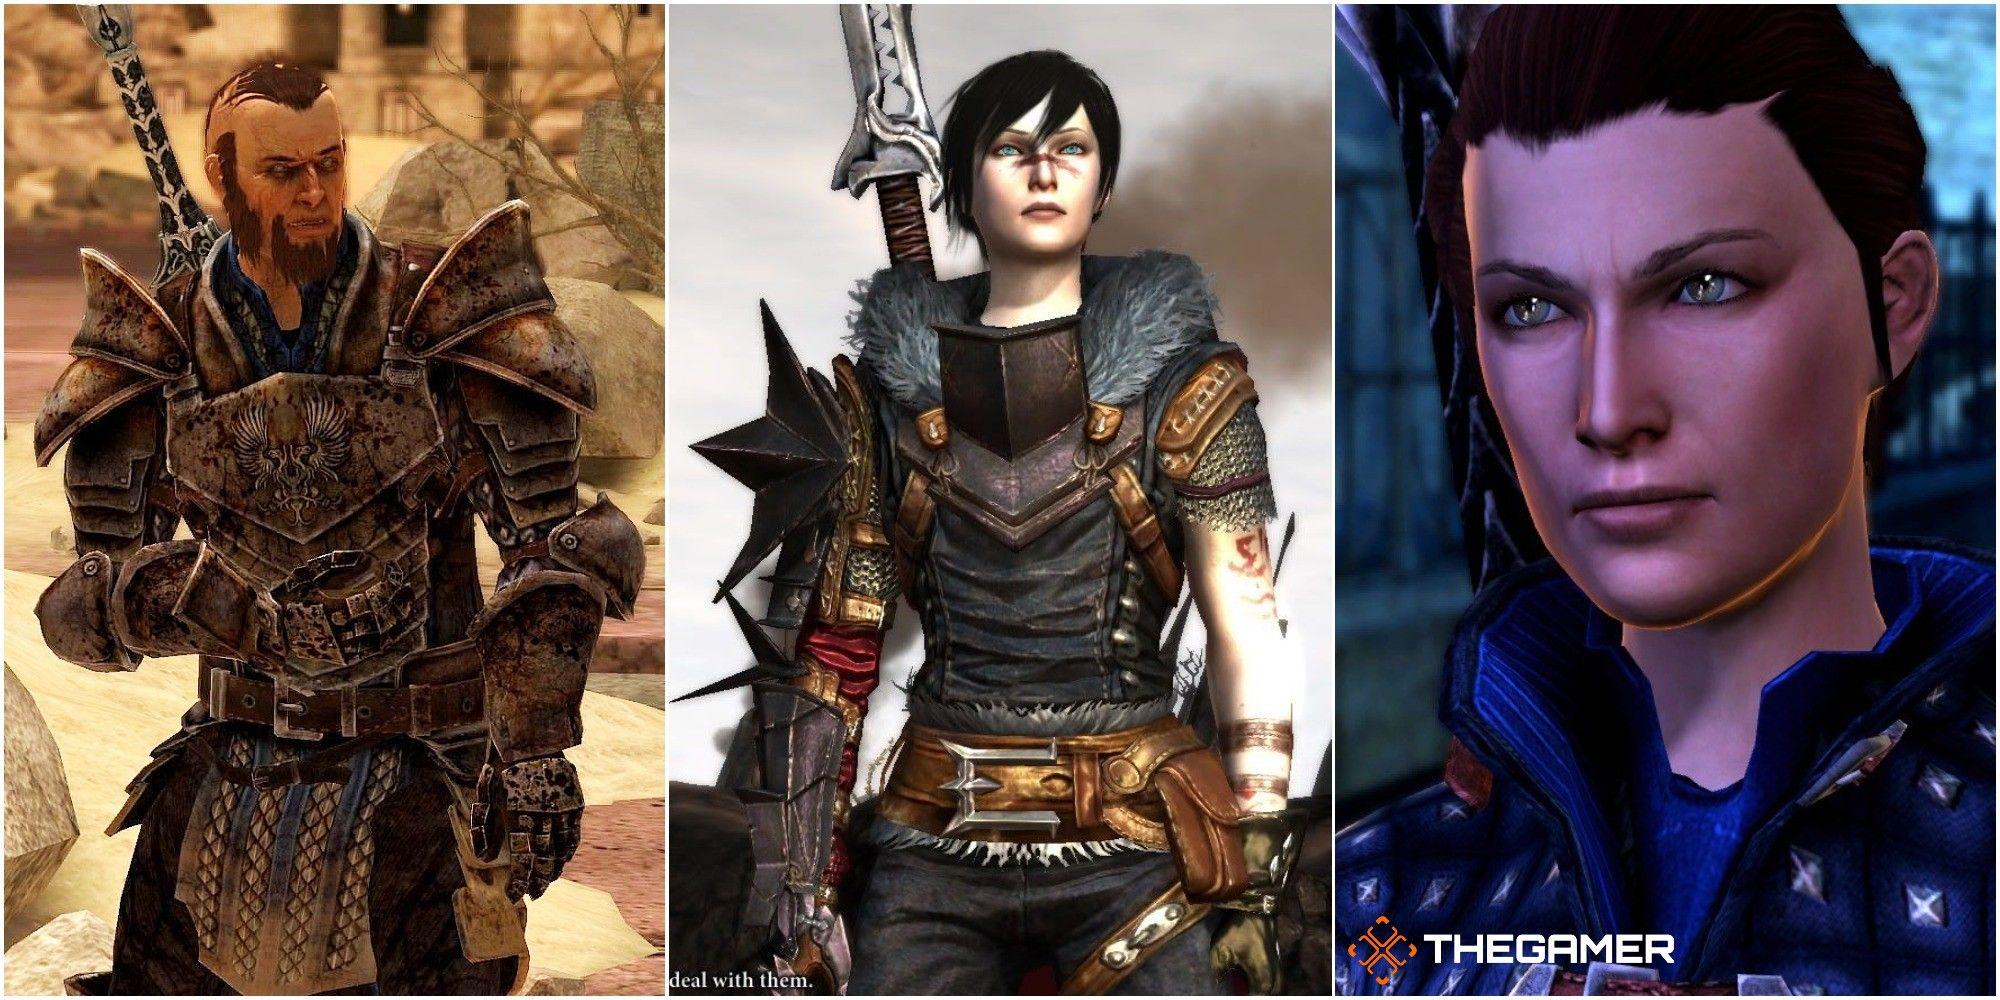 Dragon Age 2: ¿Deberías elegir a Larius o Janeka?